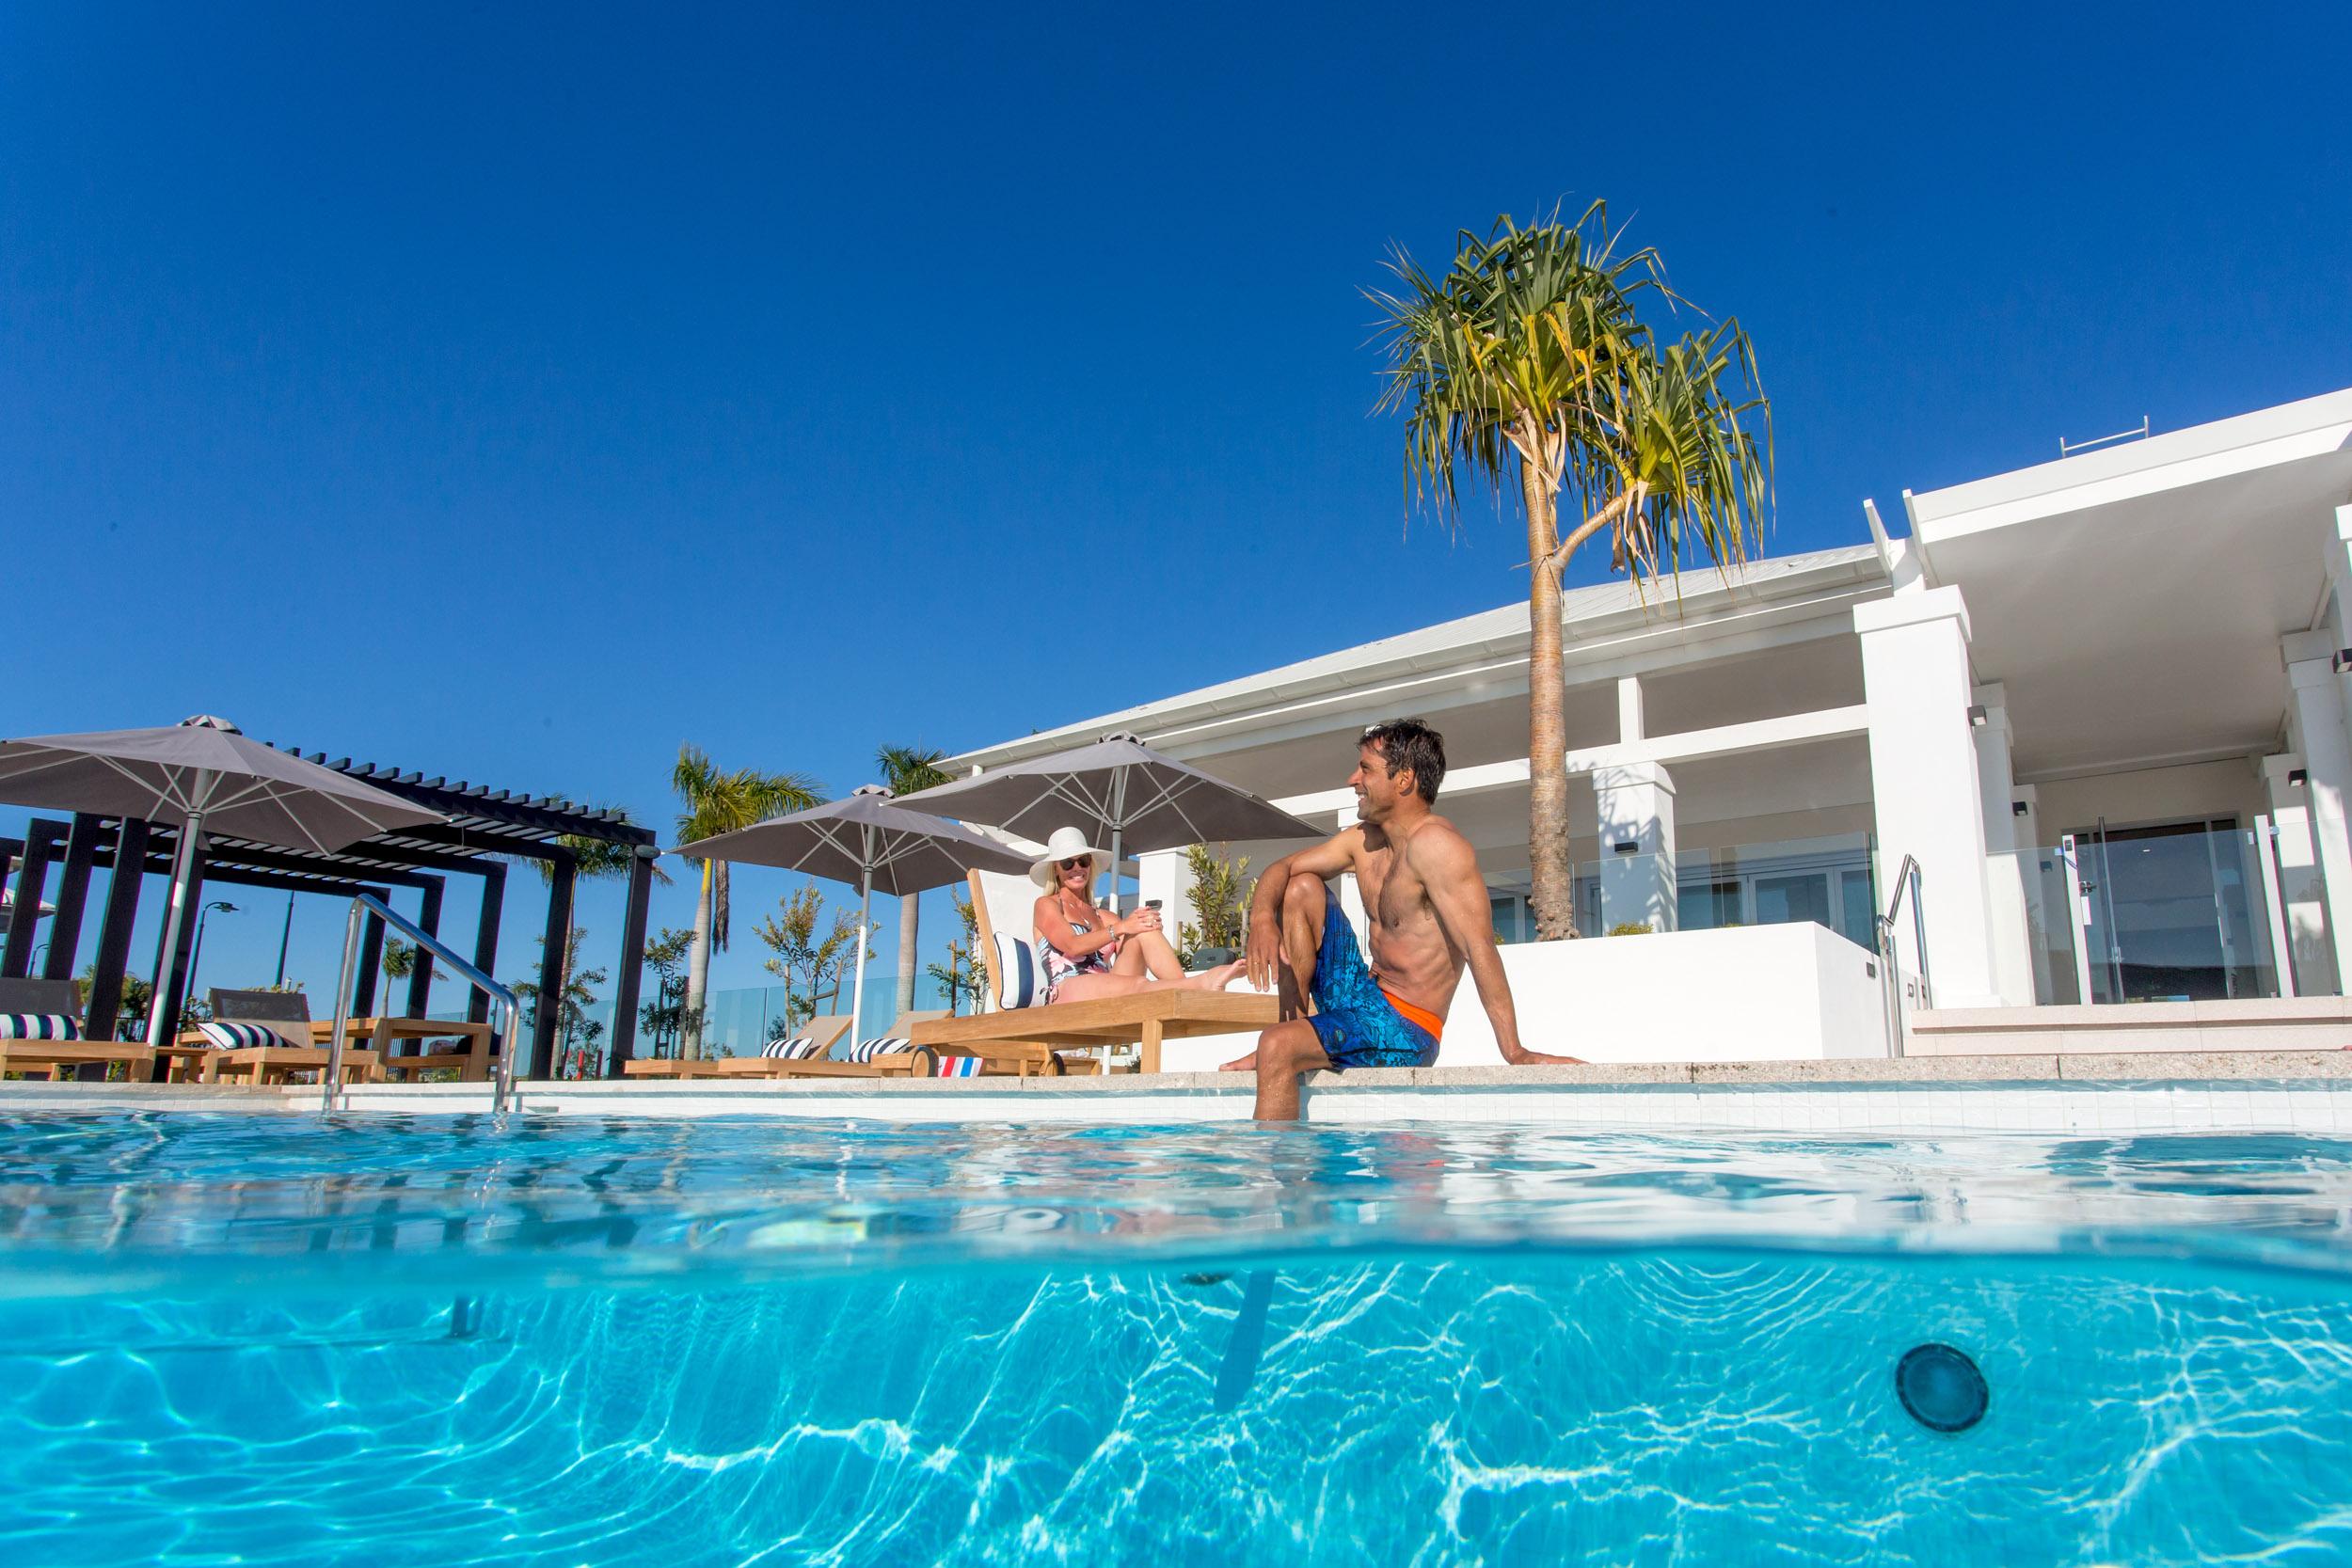 professional-resort-photography-pool.jpg